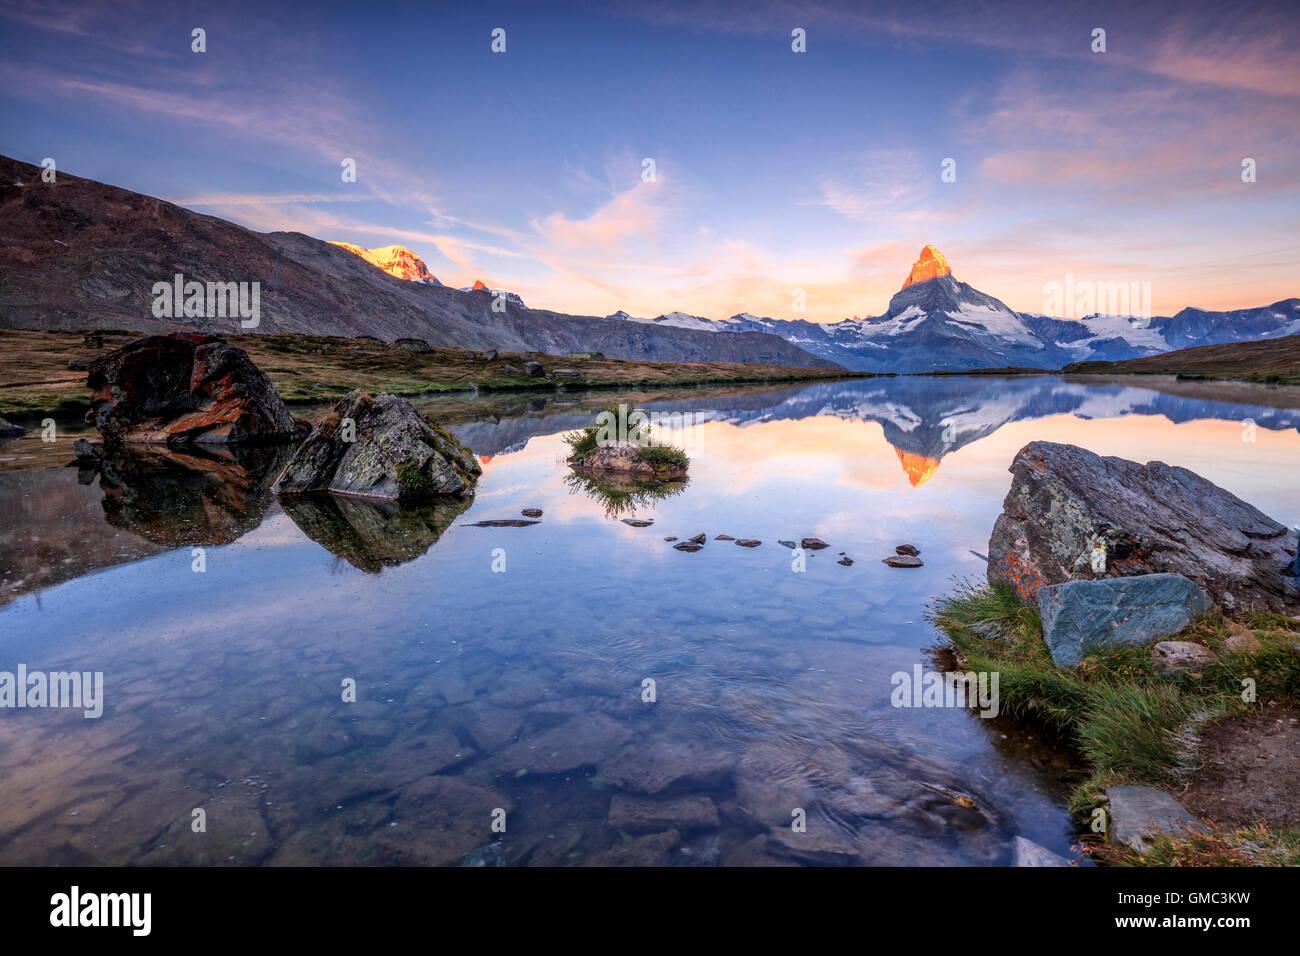 Matterhorn refleja en el lago al amanecer Stellisee cantón de Valais Zermatt Alpes Peninos Suiza Europa Imagen De Stock